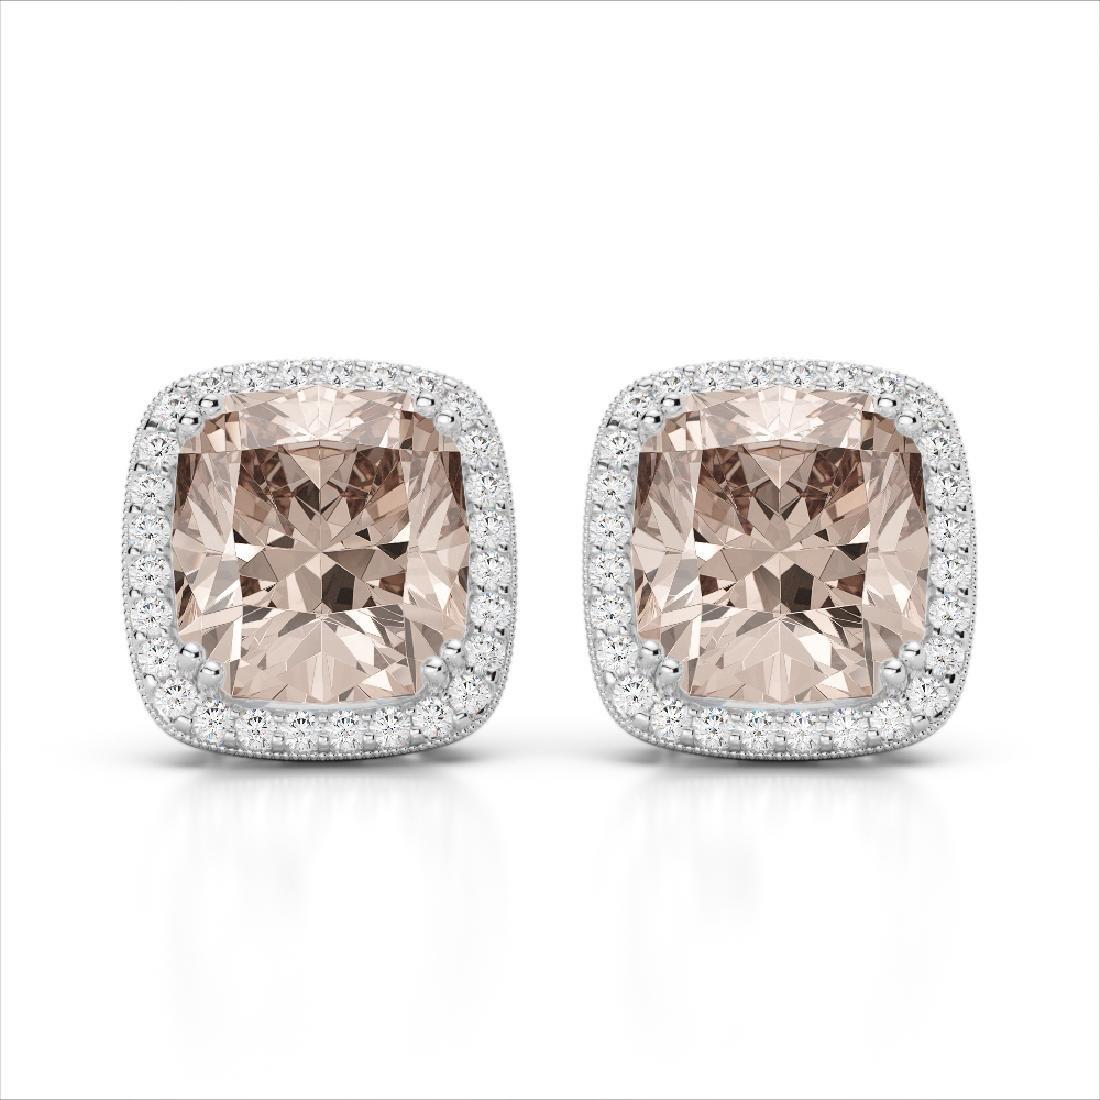 6 CTW Morganite & Micro Pave VS/SI Diamond Halo